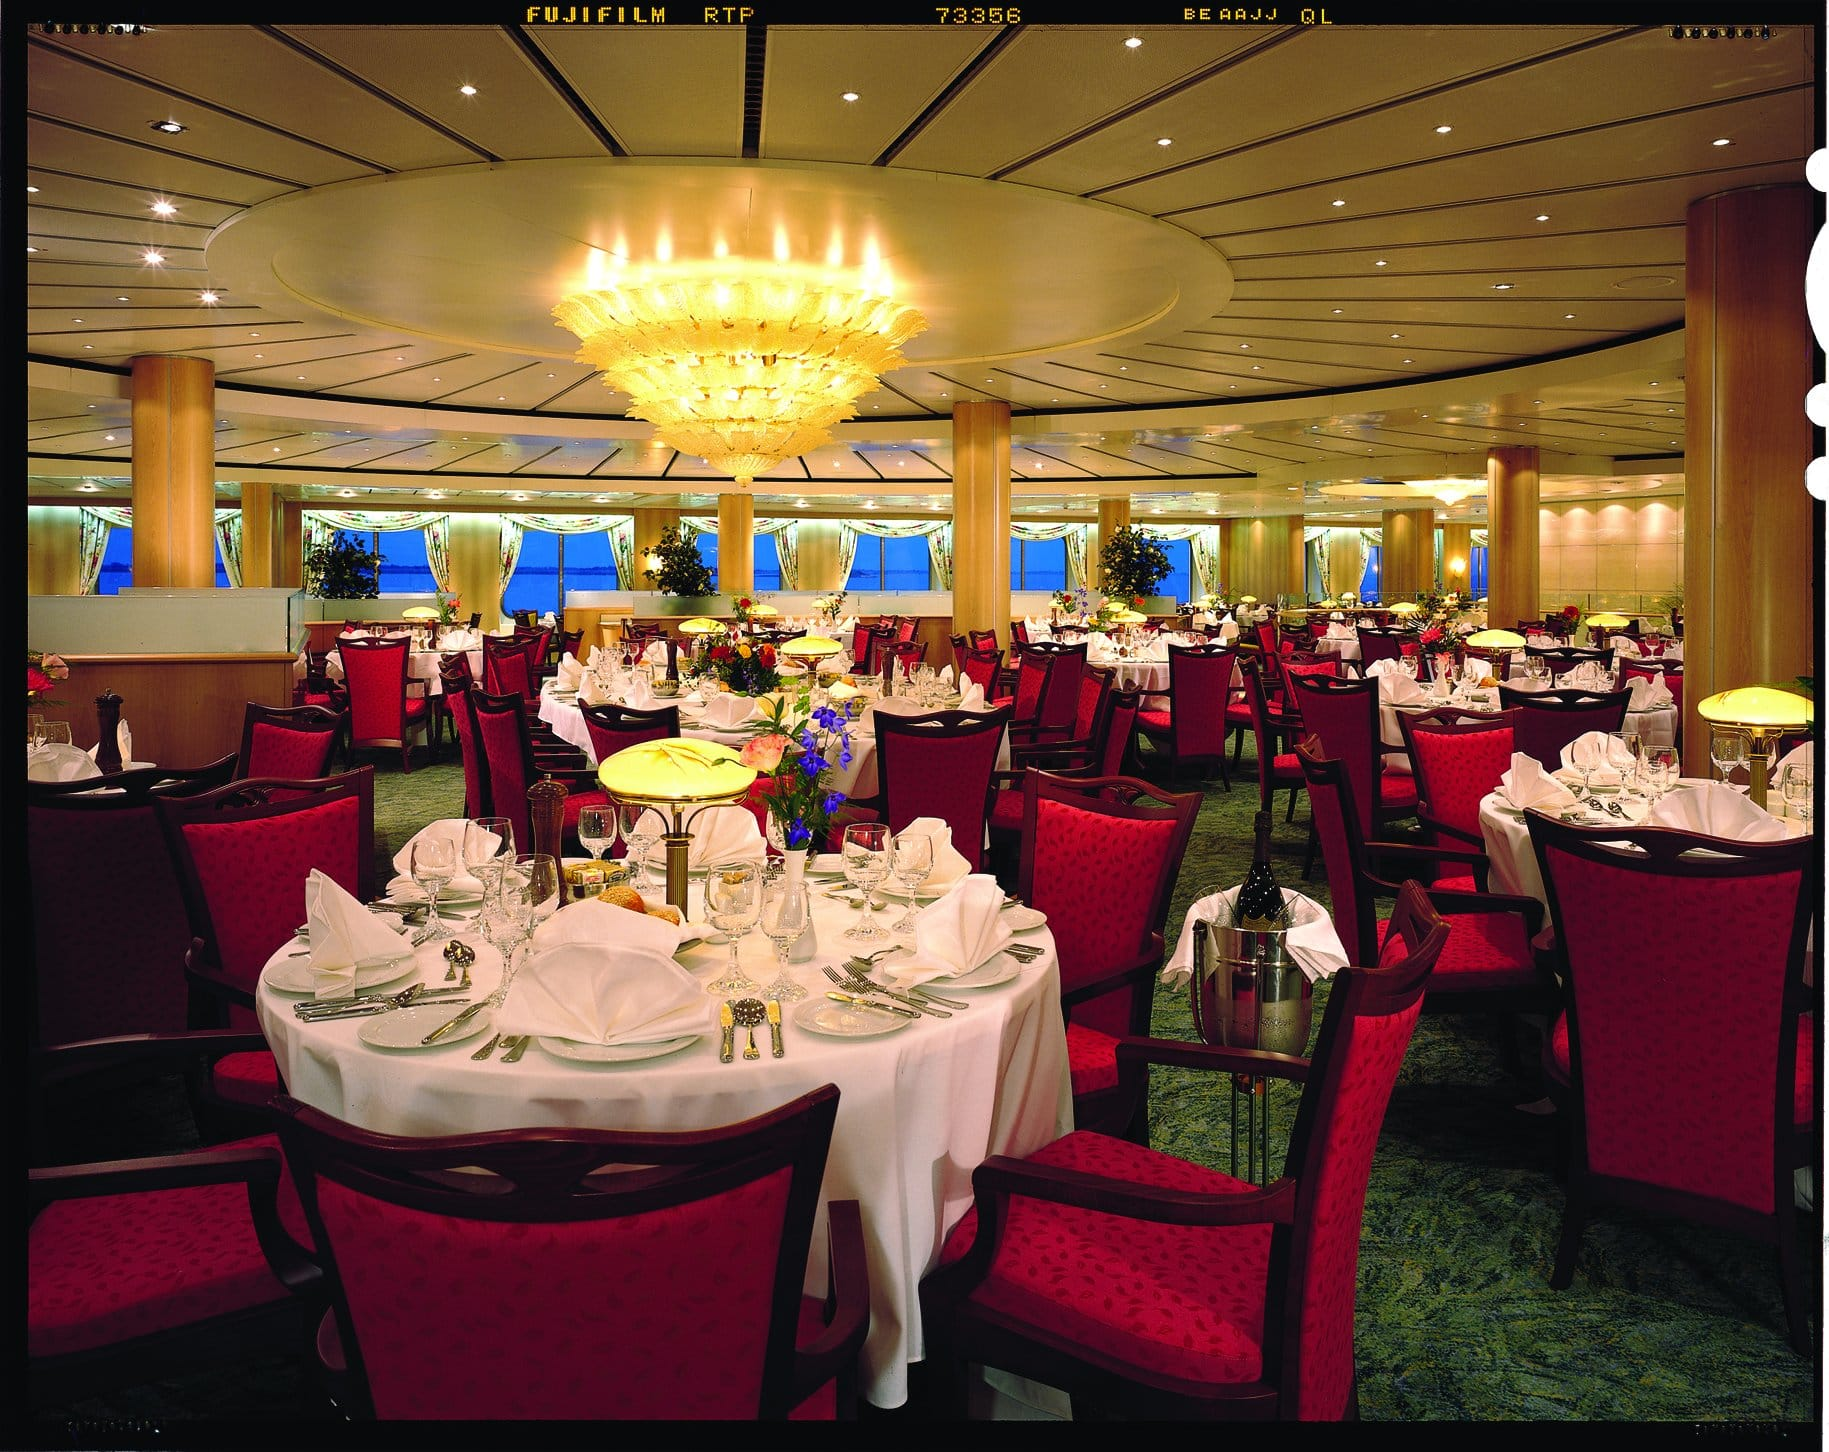 La Sirena Main Dining Room